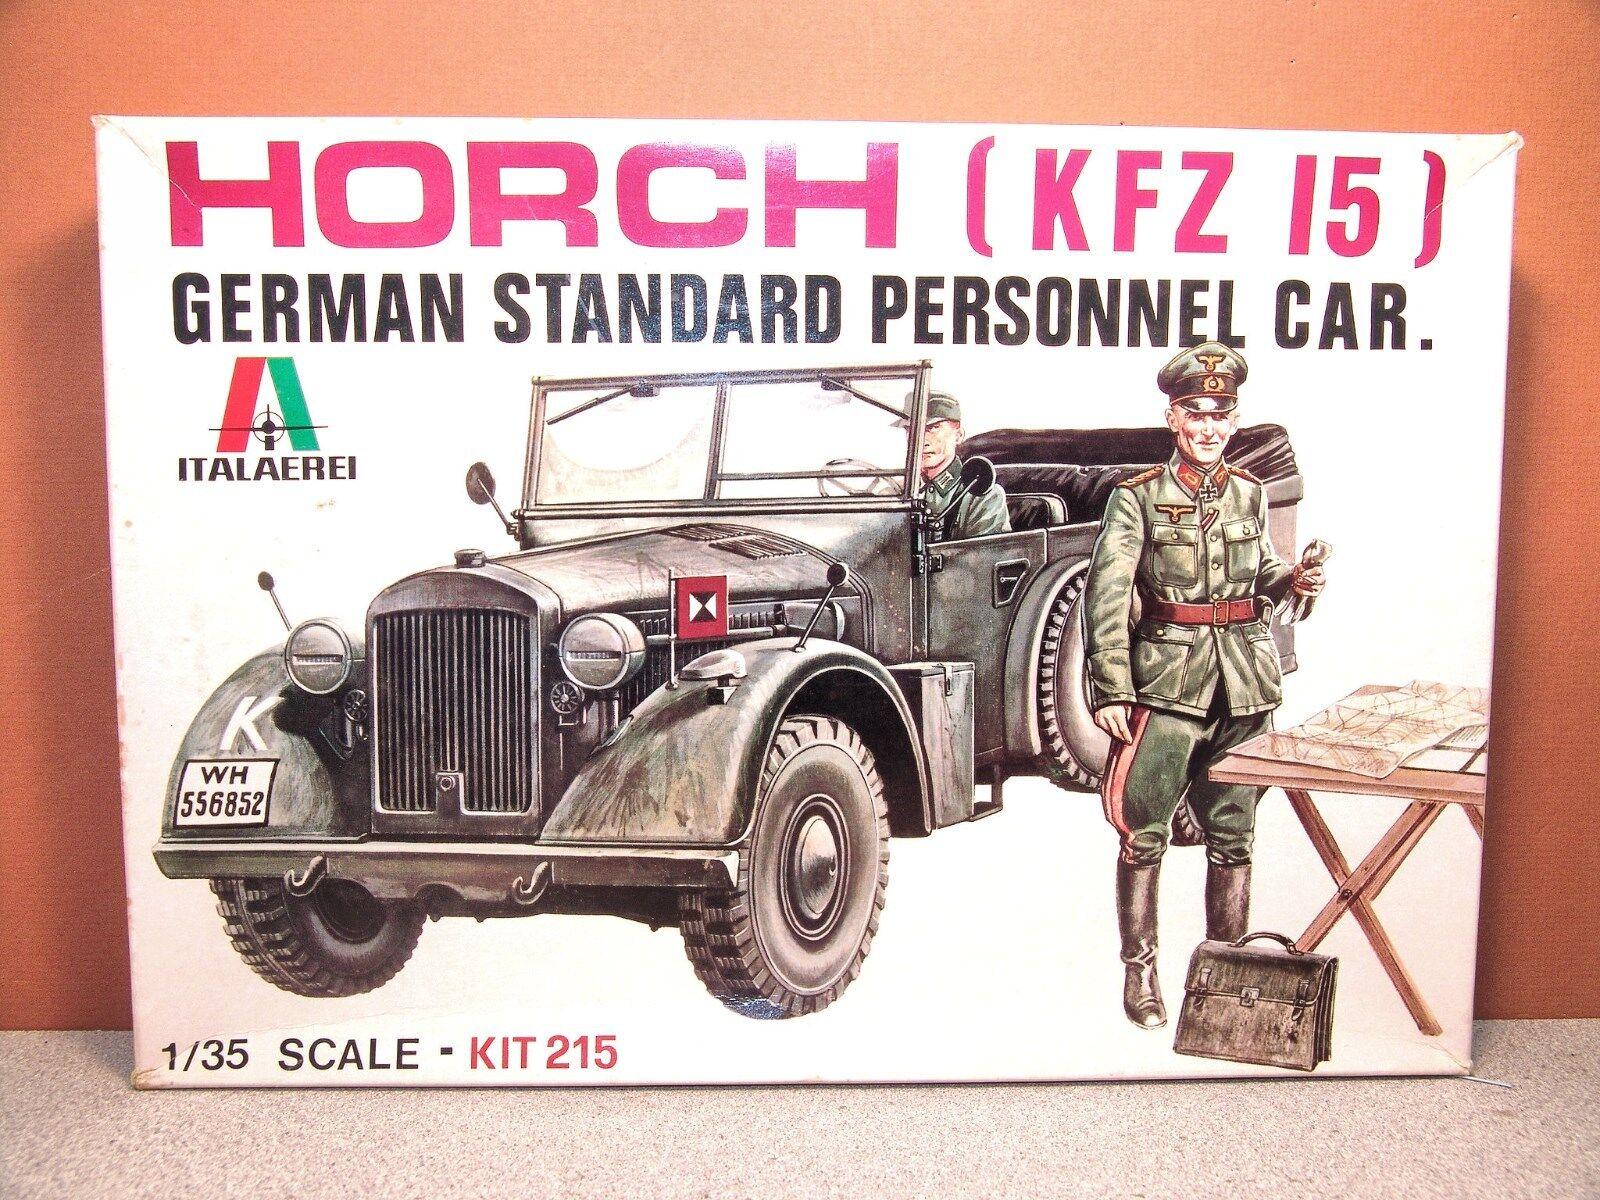 1 35 ITALERI HORCH KFZ15 GERMAN STANDARD PERSONNEL CAR MODEL KIT